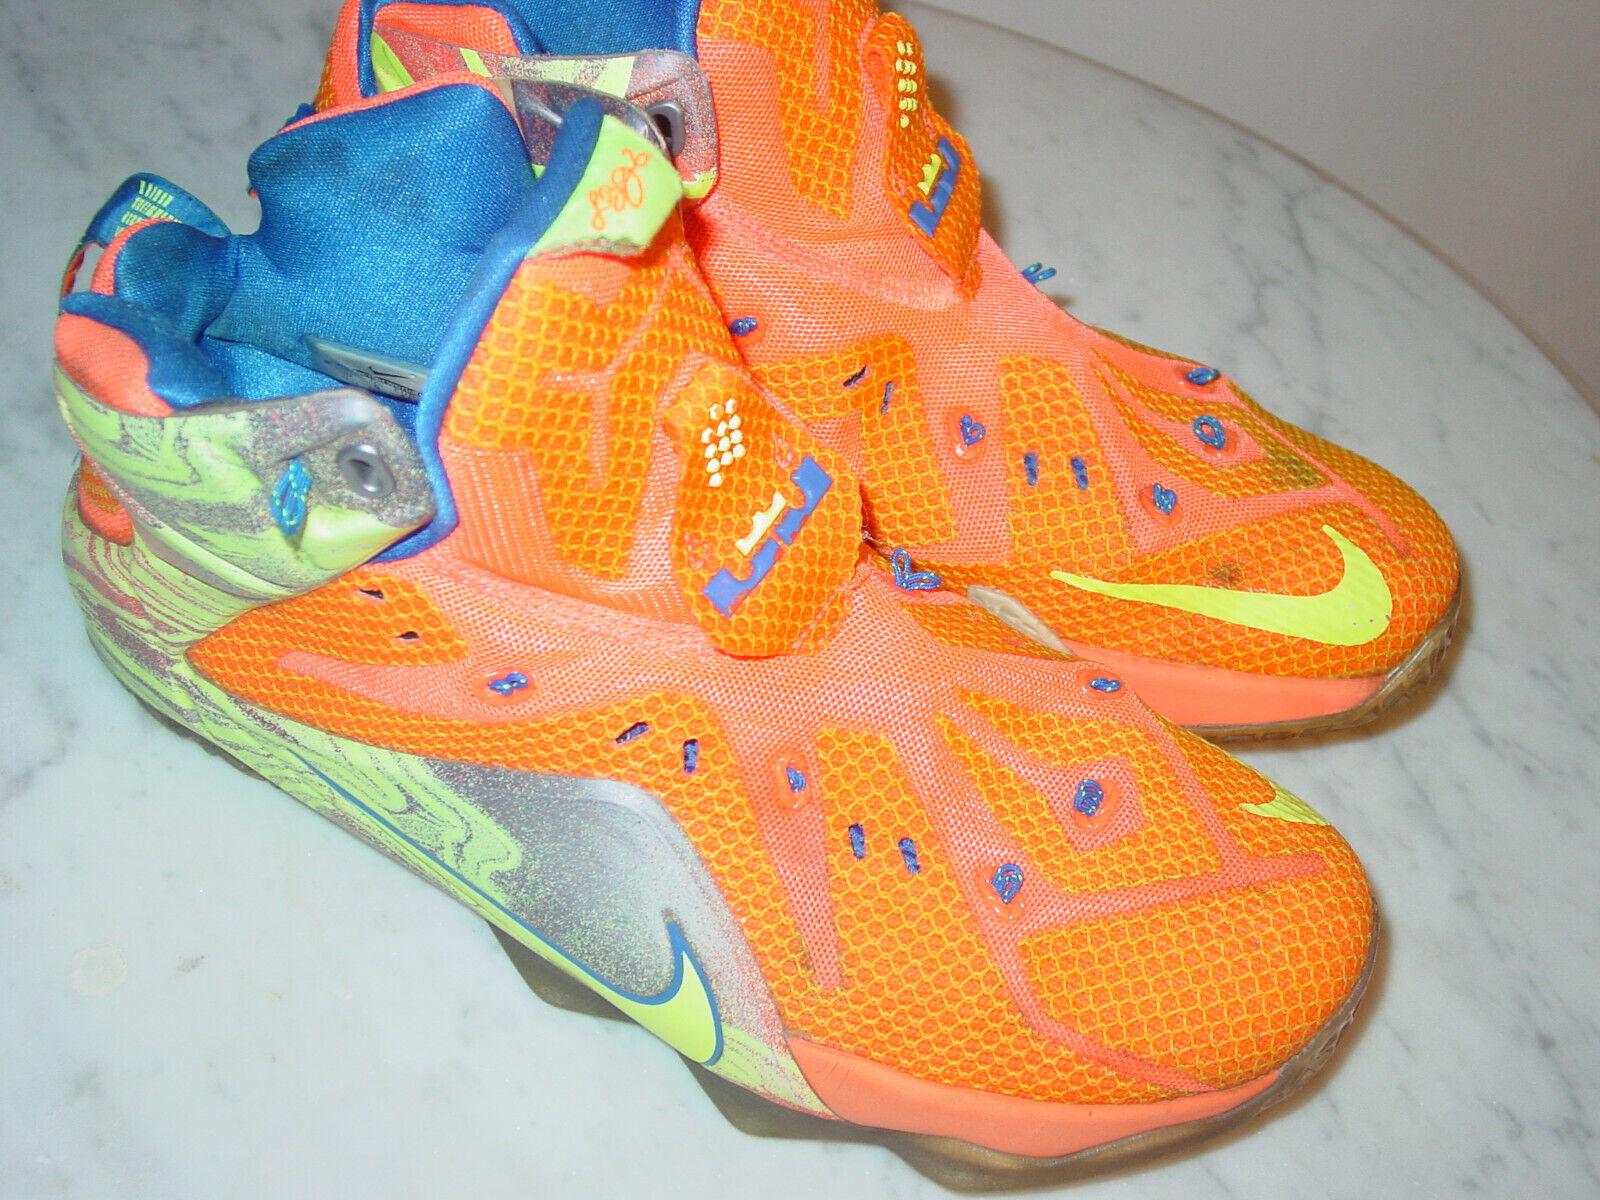 2014 Nike Lebron 12  Six Six Six Meridians  Hyper Crimson shoes  Size 10 Sold As Is  b0b1ce